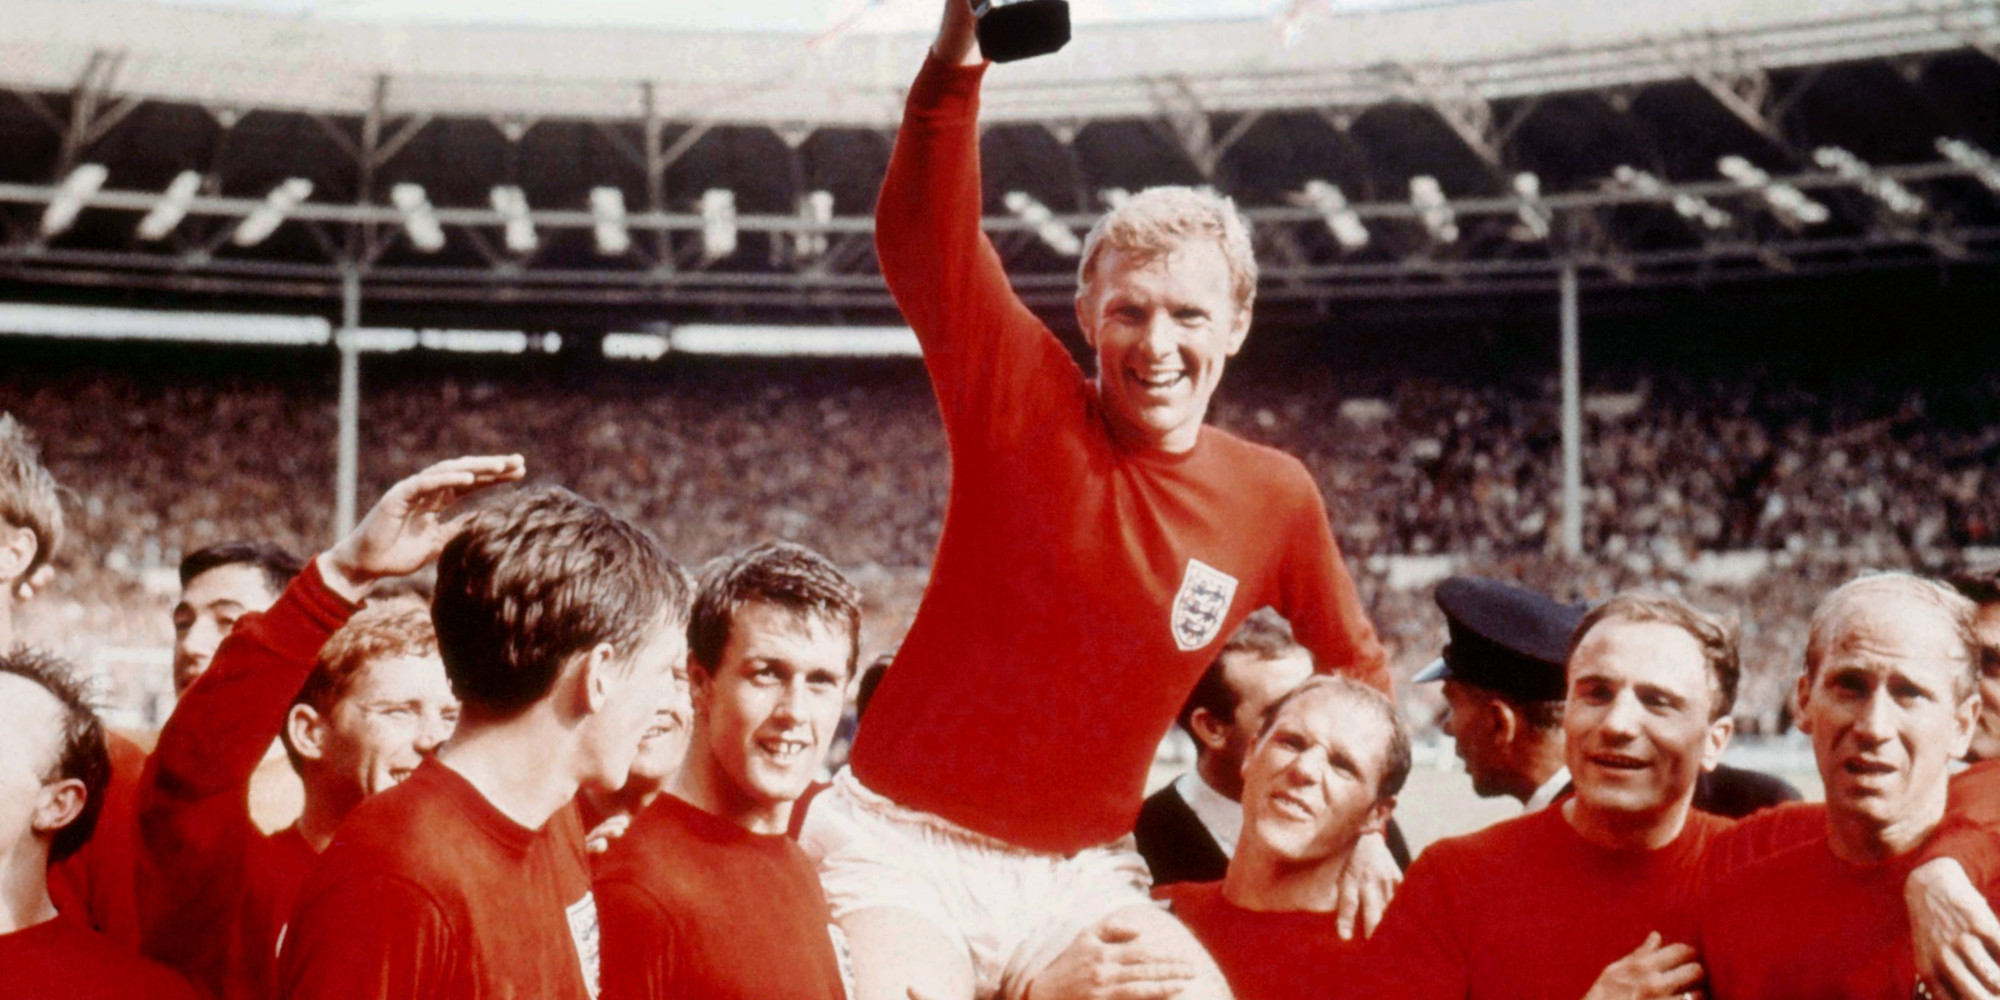 https://i0.wp.com/i.huffpost.com/gen/1836074/images/o-1966-WORLD-CUP-FINAL-facebook.jpg